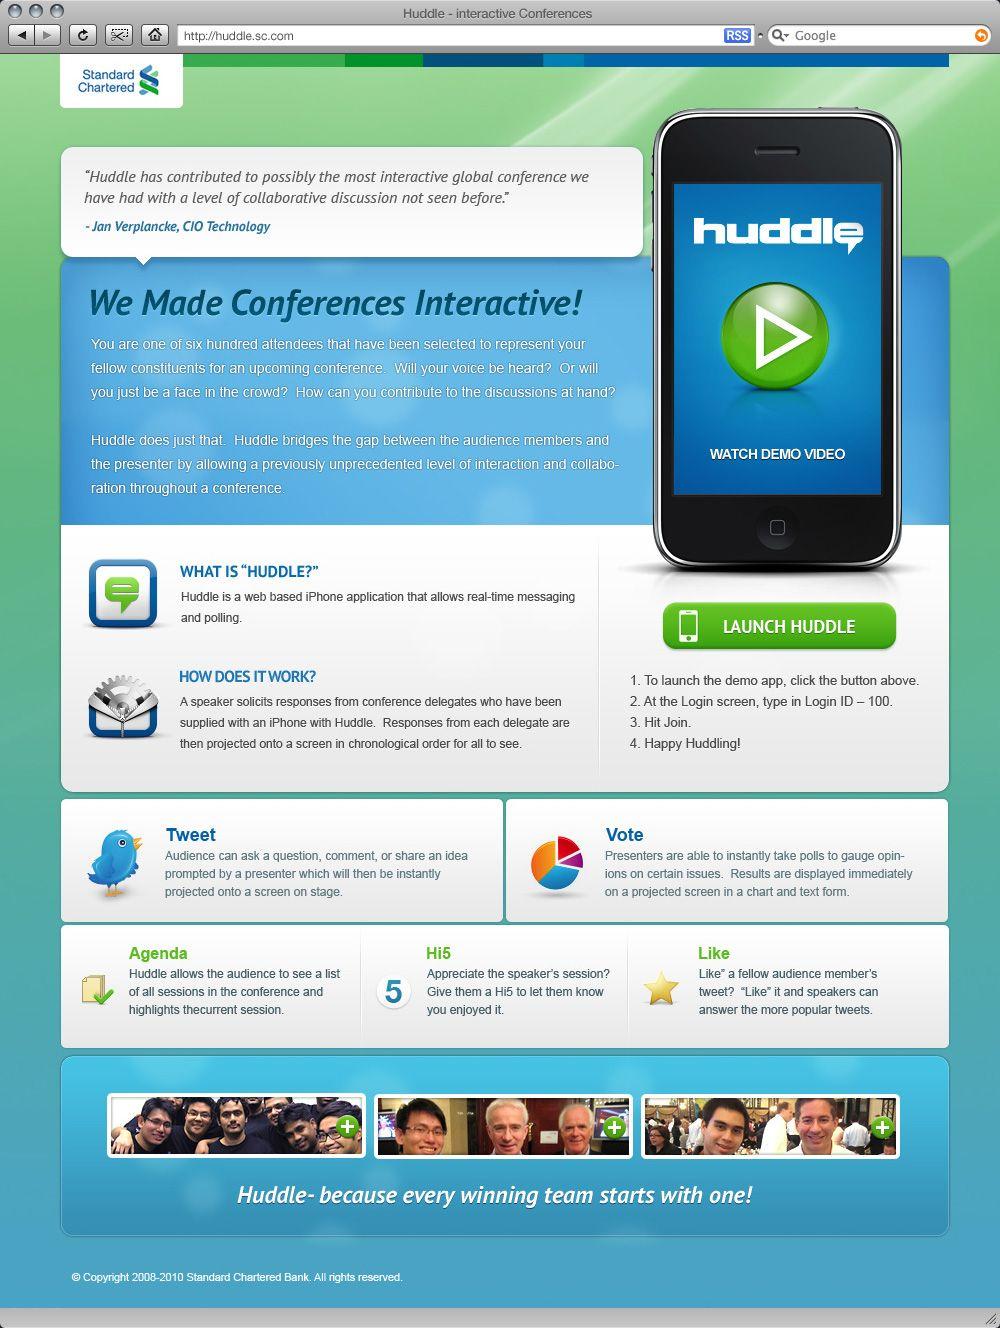 Design Web Huddle Standard Chartered Http Xtrudestudios Com Http Huddle2 Com Huddle Mov Demo Video Web Design Interactive